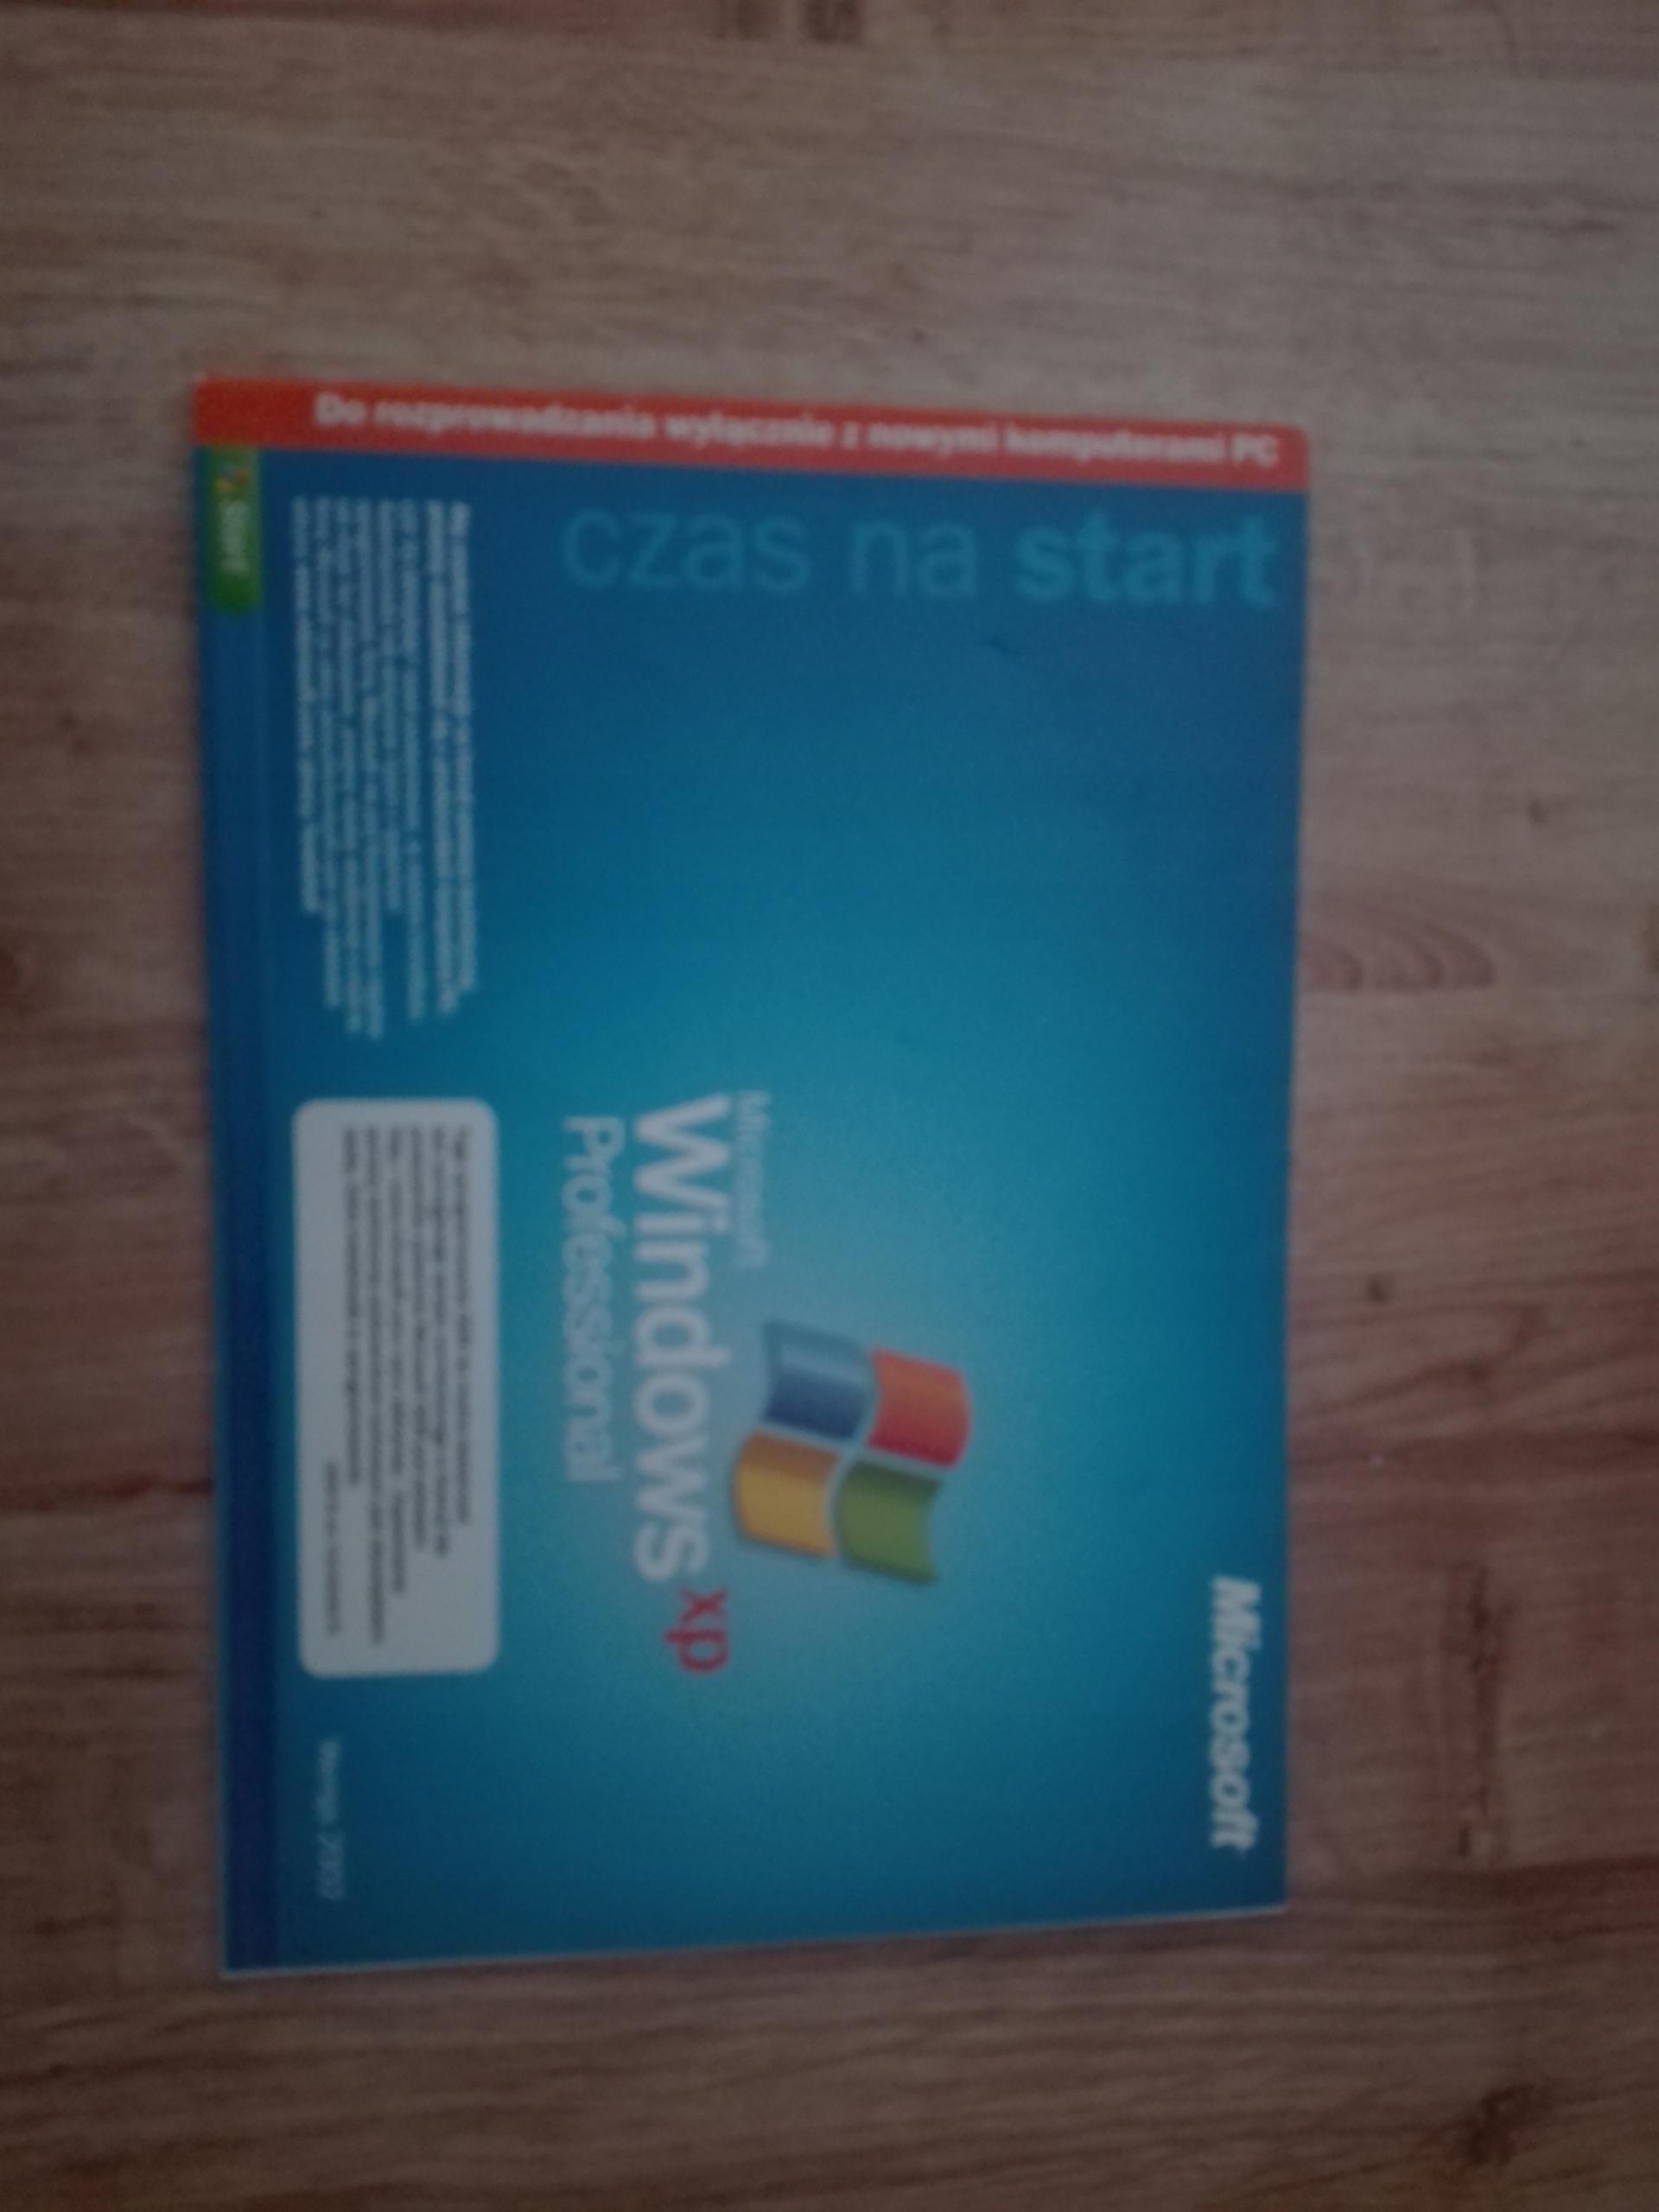 WINDOWS XP PROFESSIONAL WERSJA 2002